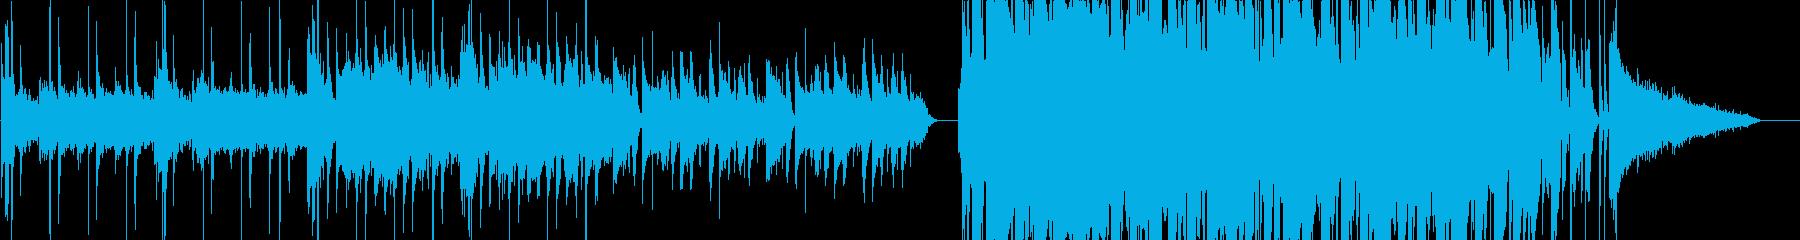 CMの再生済みの波形